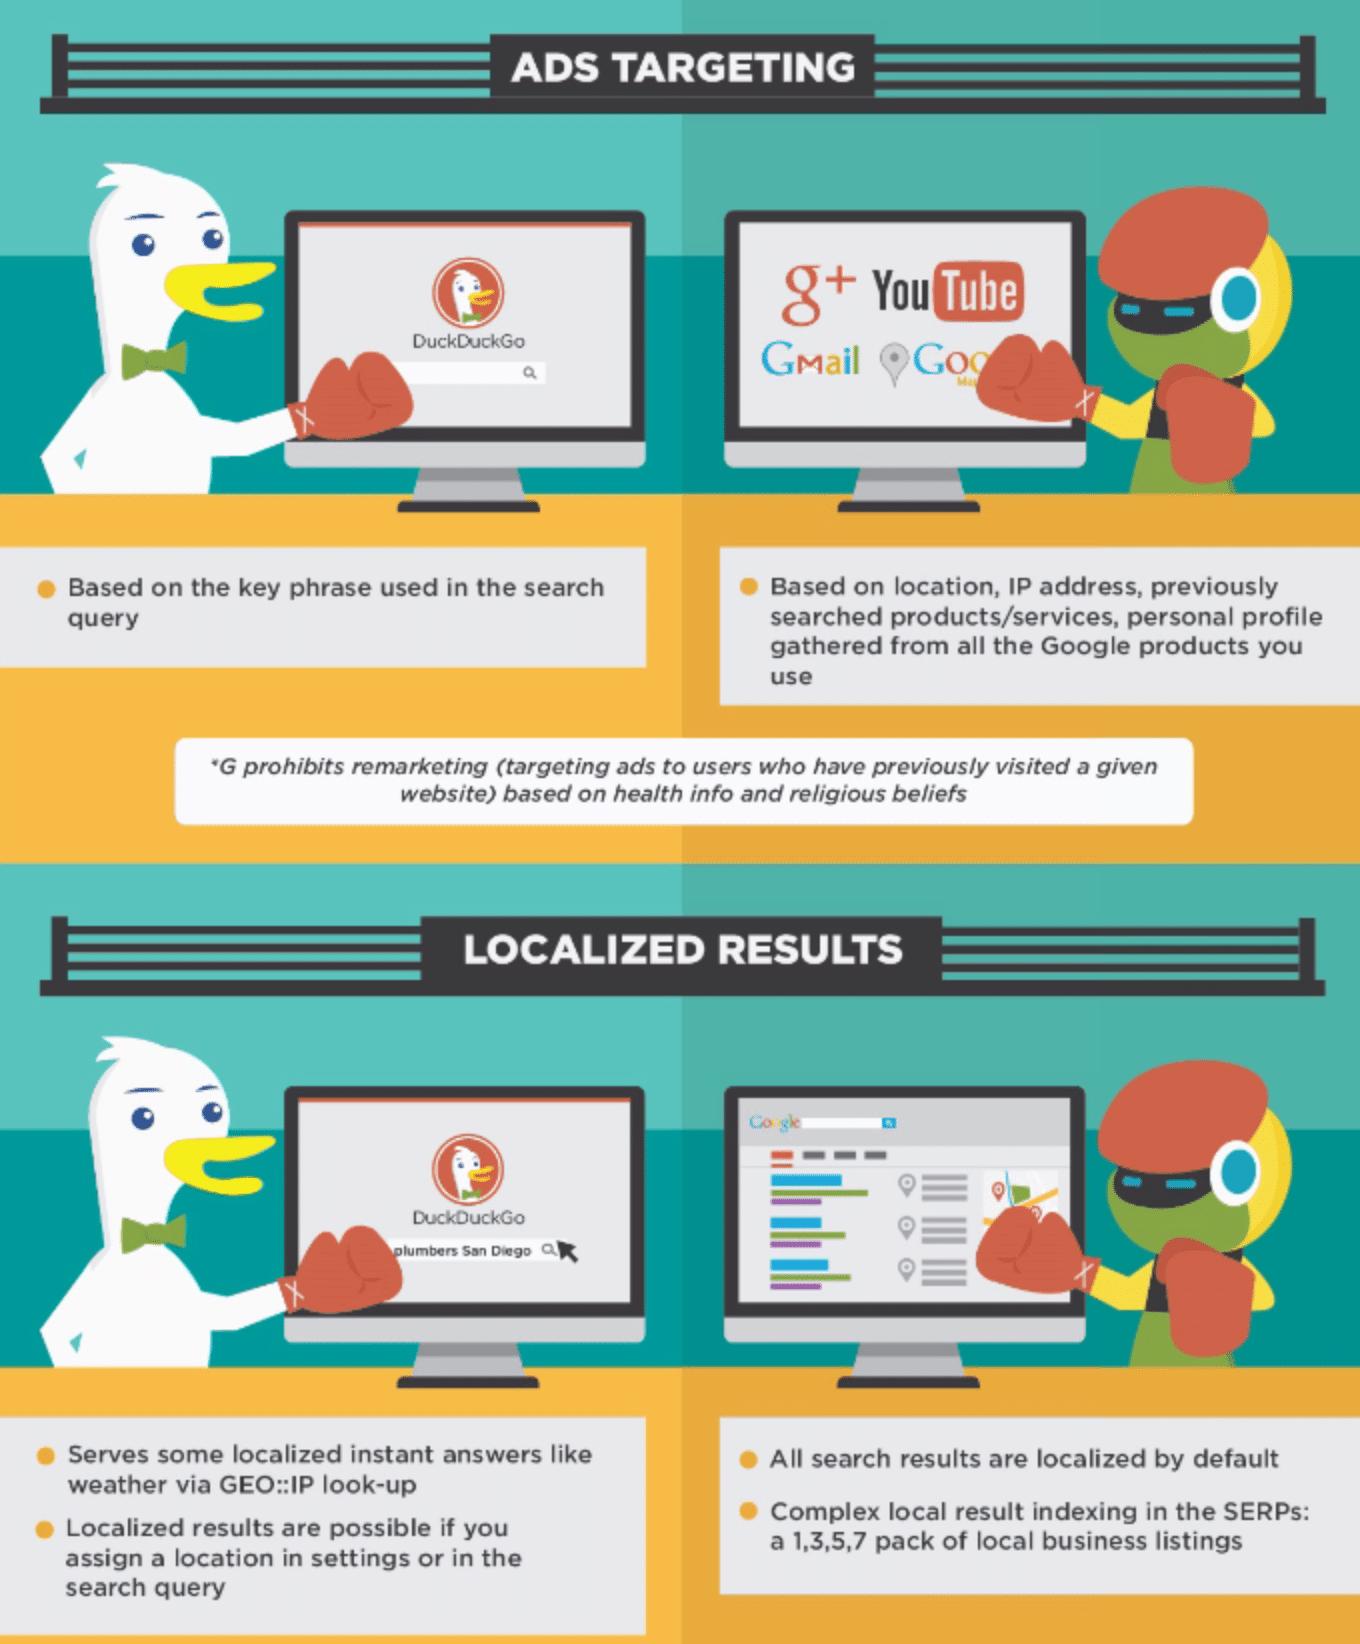 DuckDuckGo-Google-Search-10